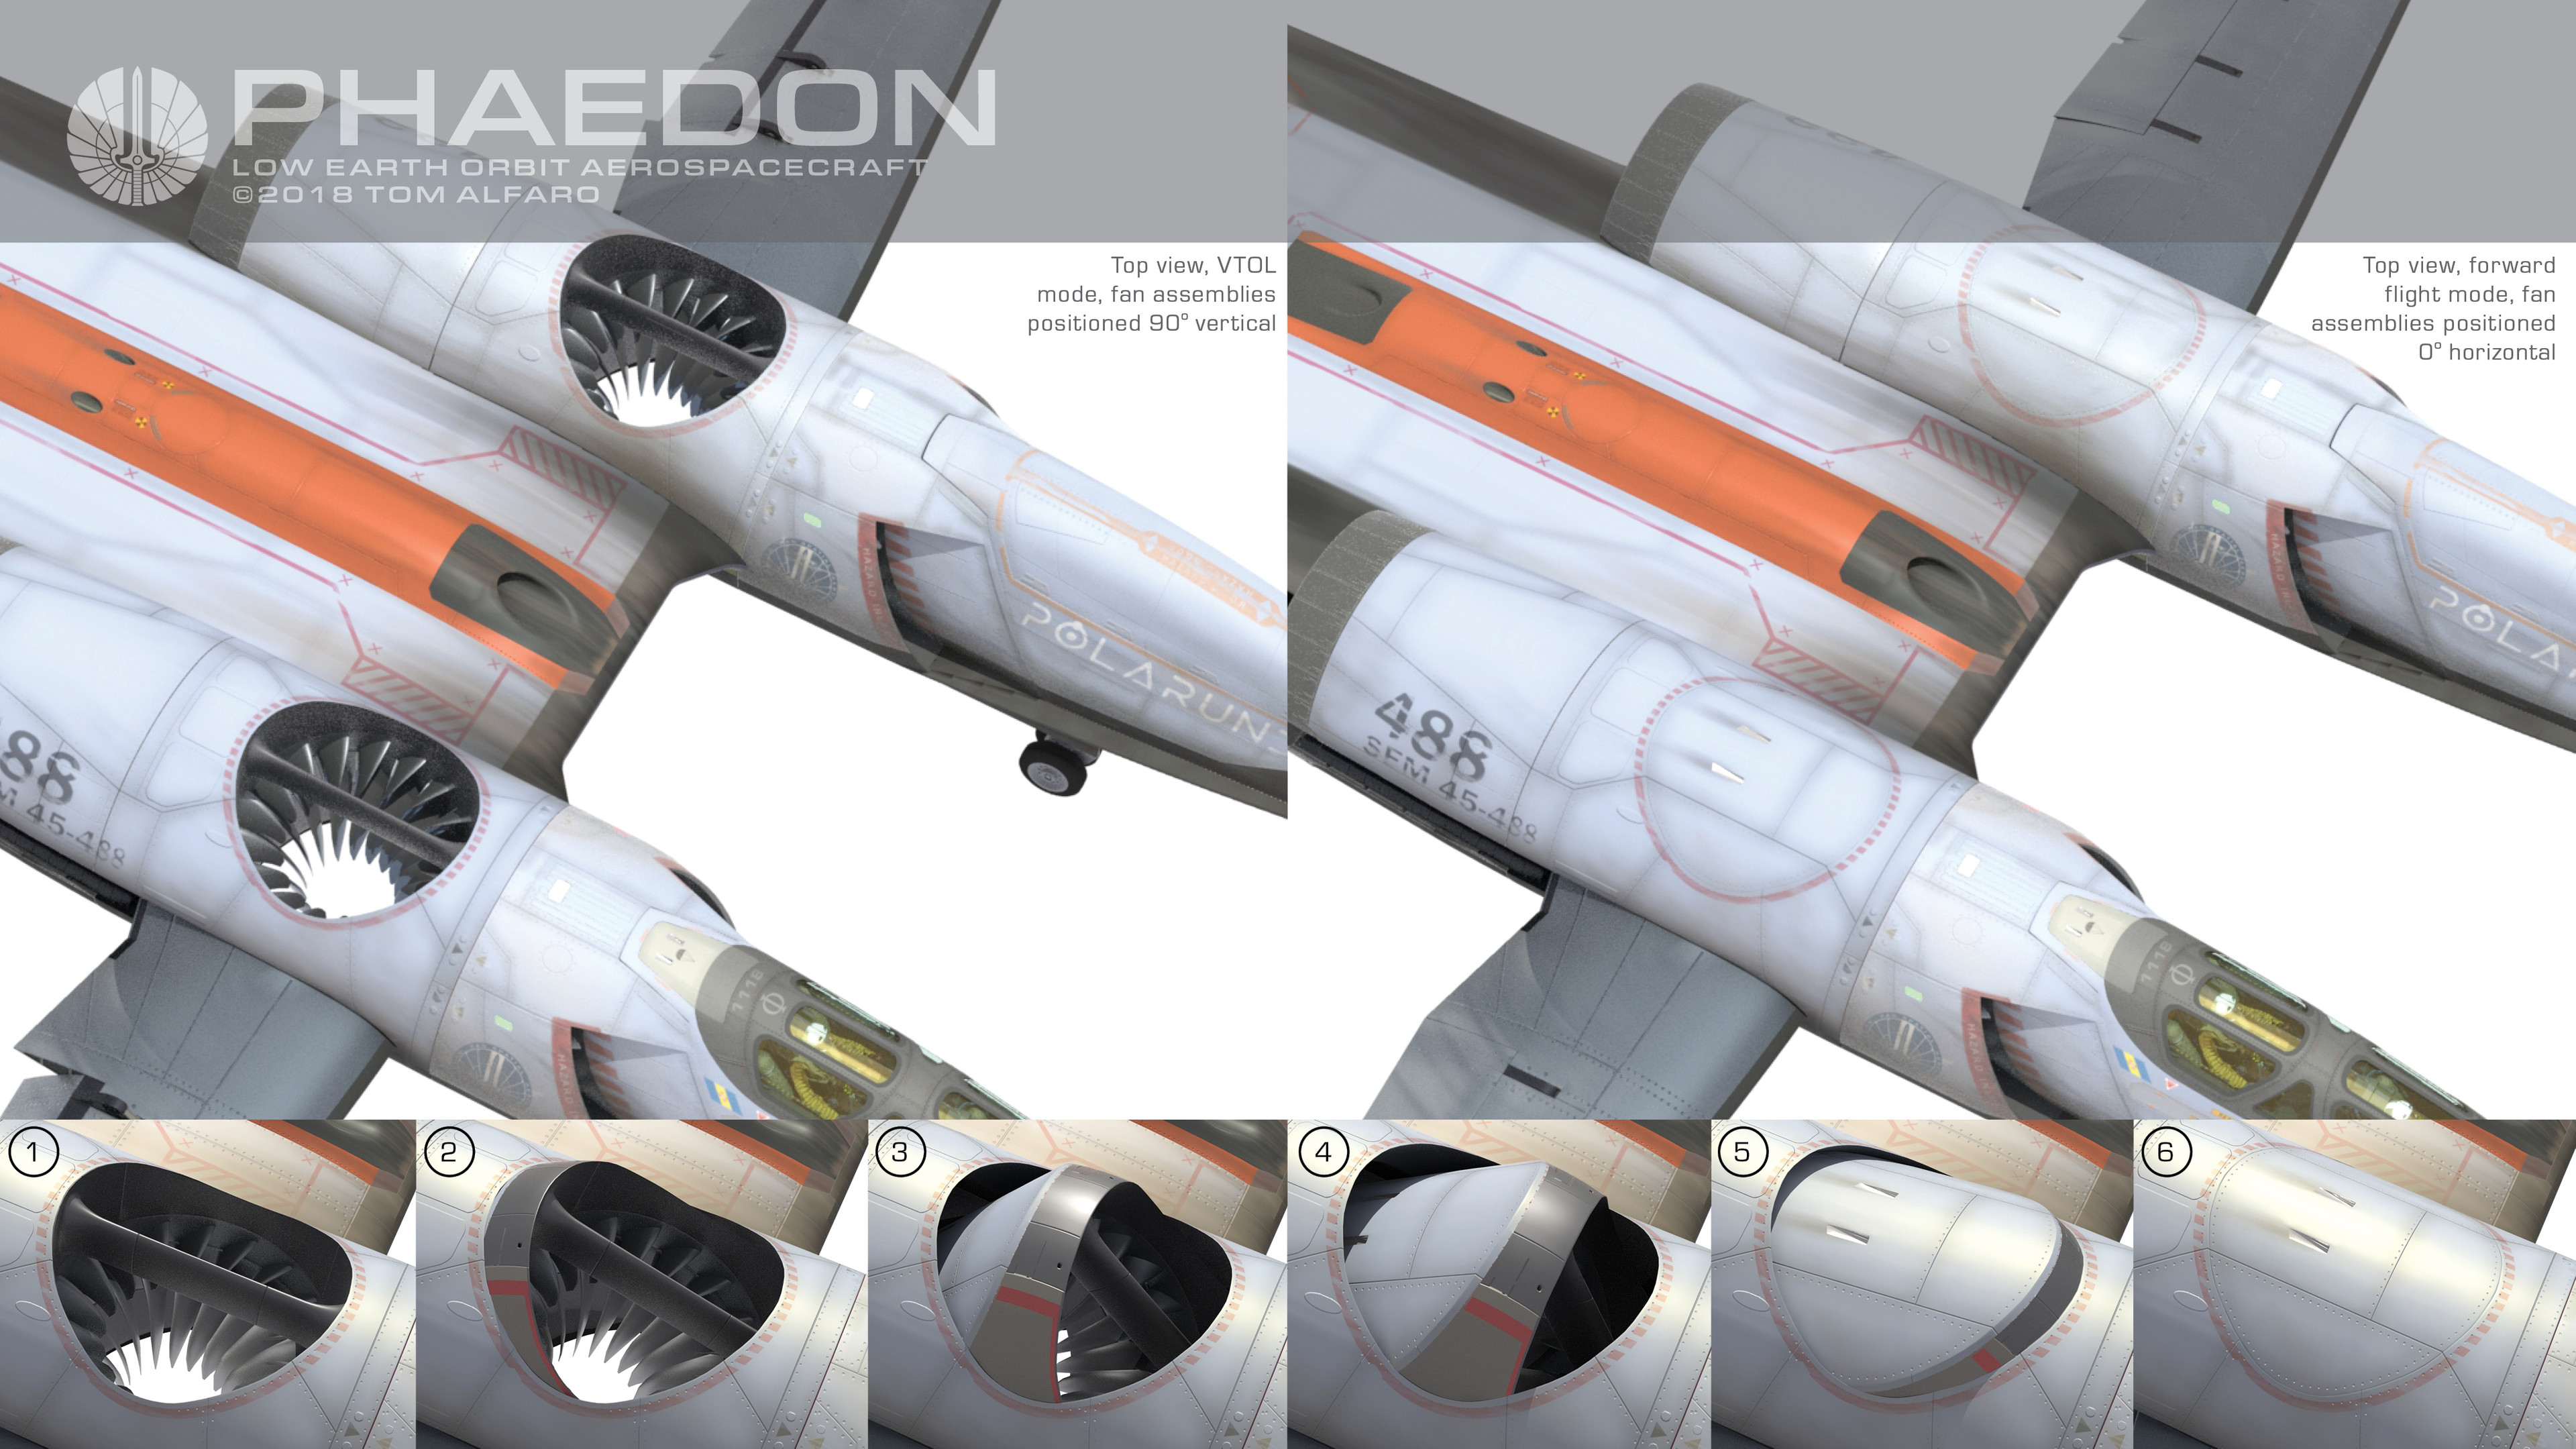 Top view, steps 1-6: Fan assembly transitions from 90 deg VTOL mode to forward flight.